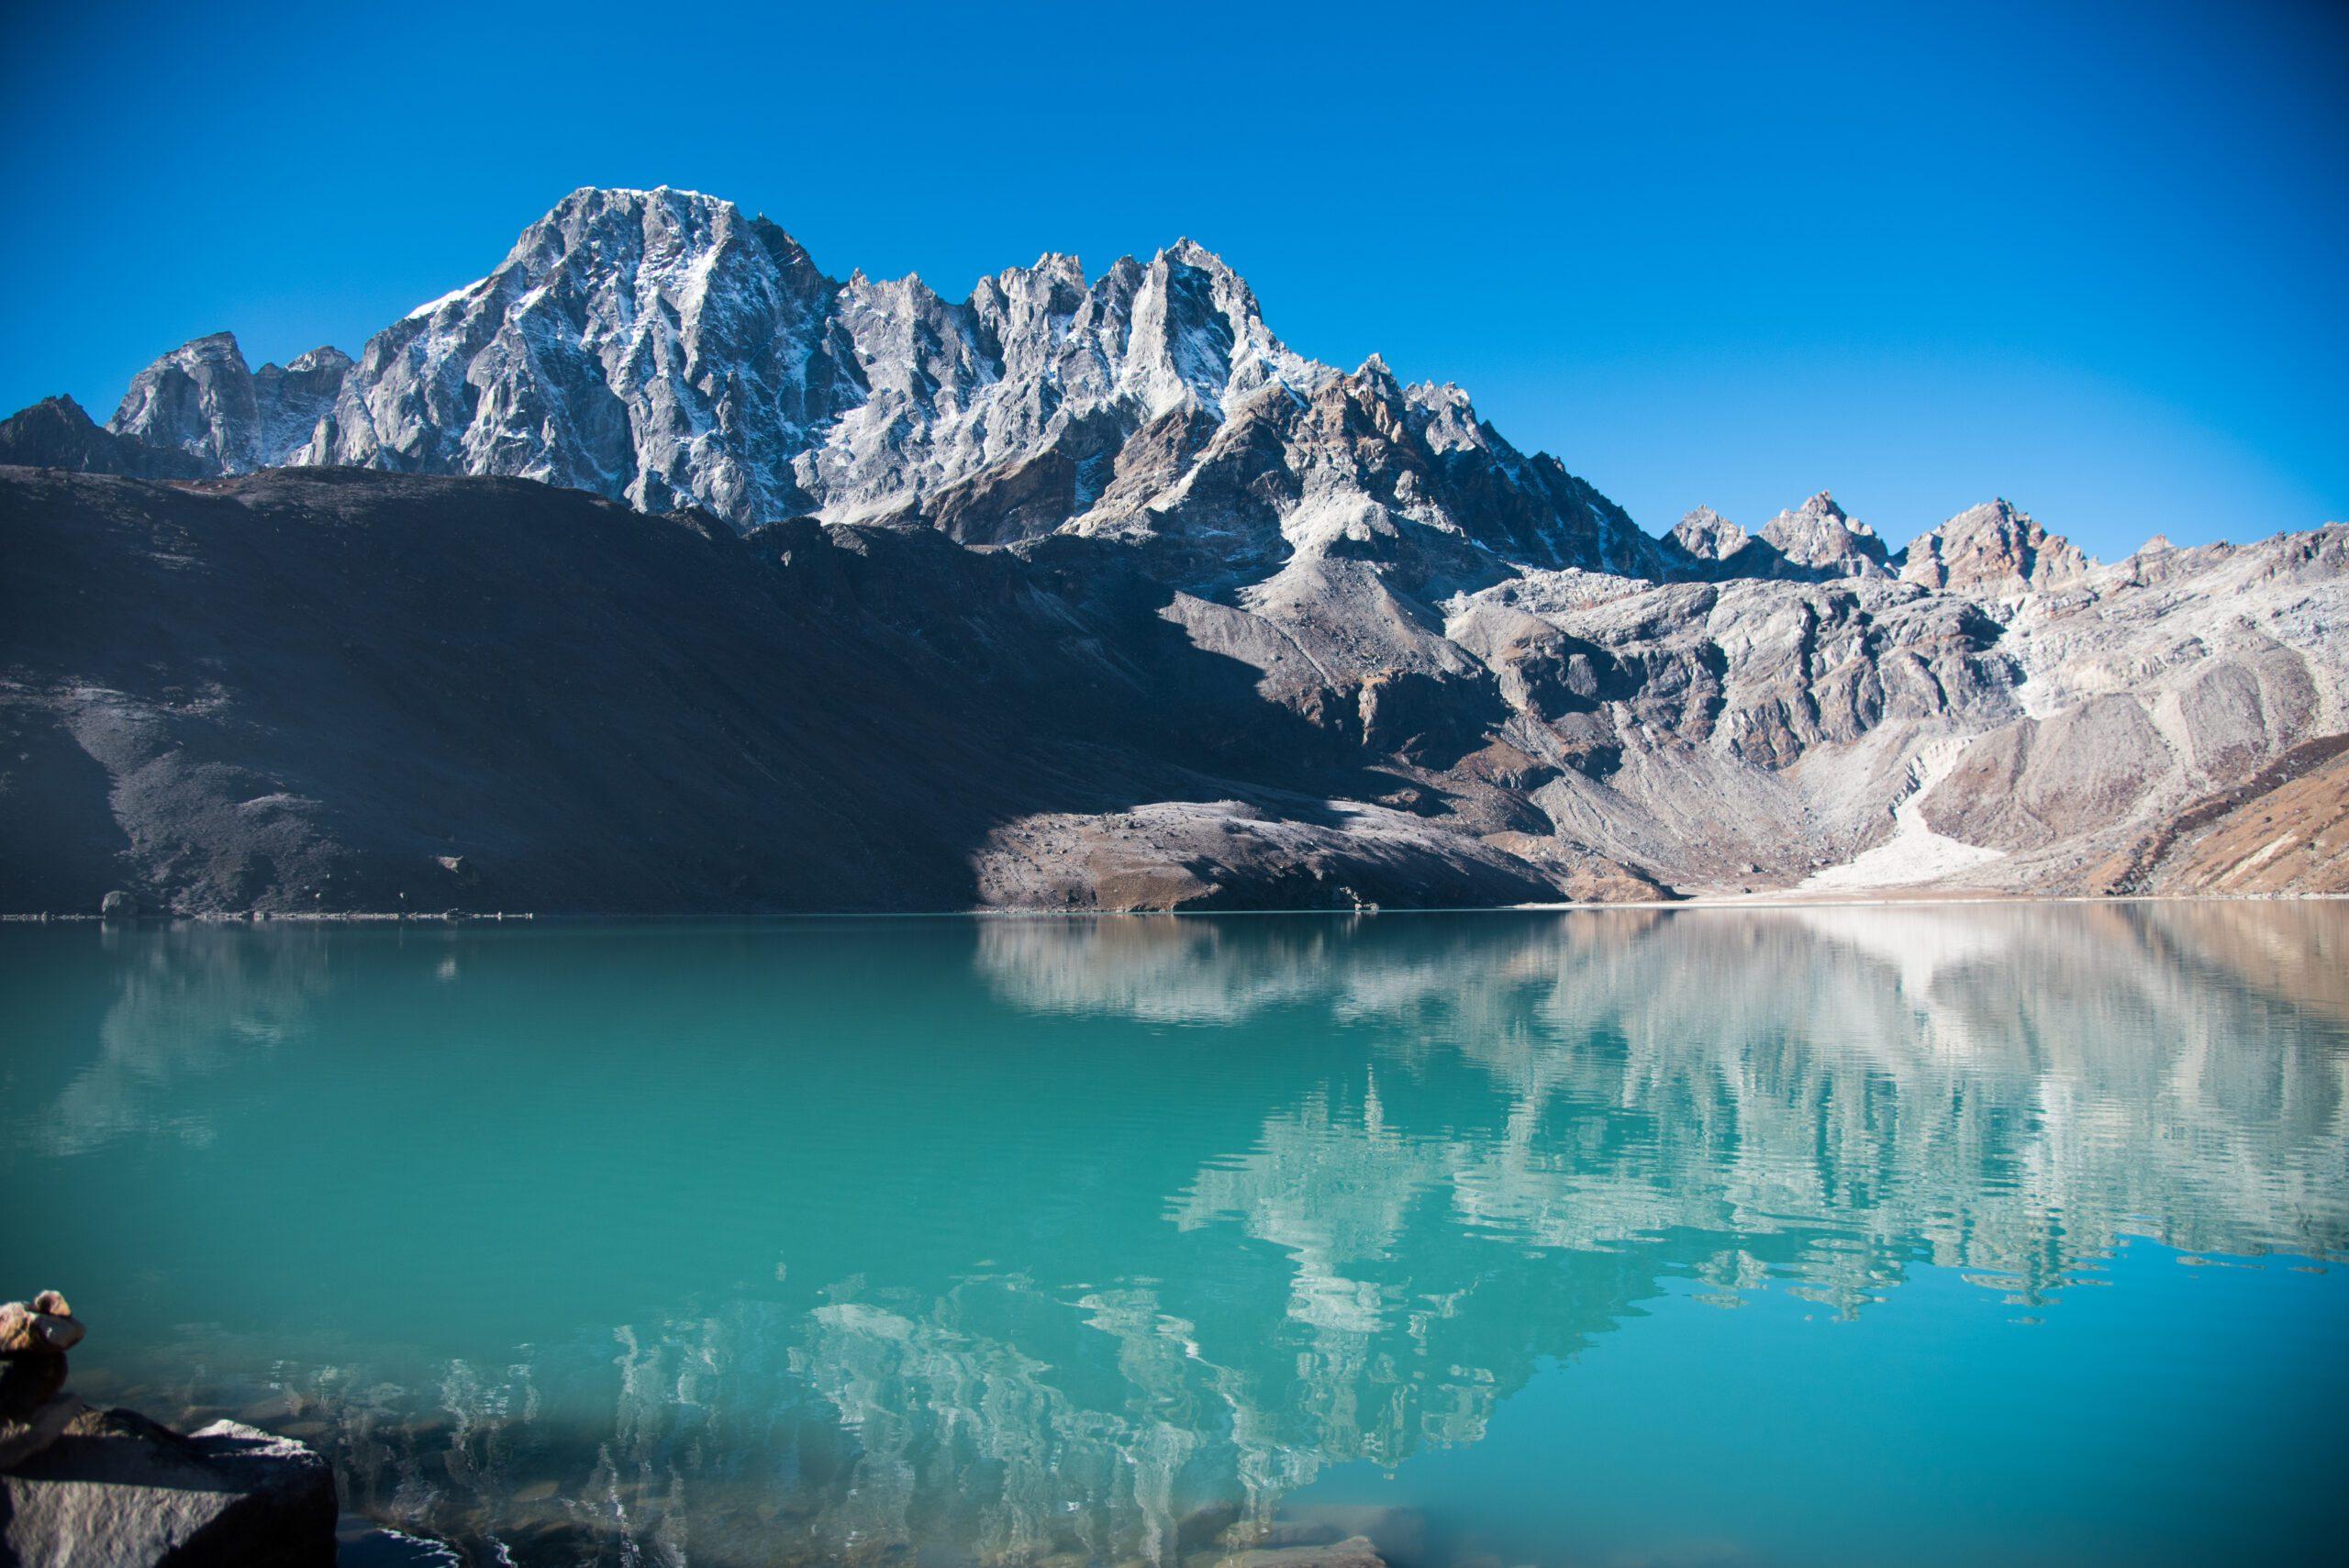 himalaji estadventure nepal planinarenje uspon everest katmandu himalaya beograd